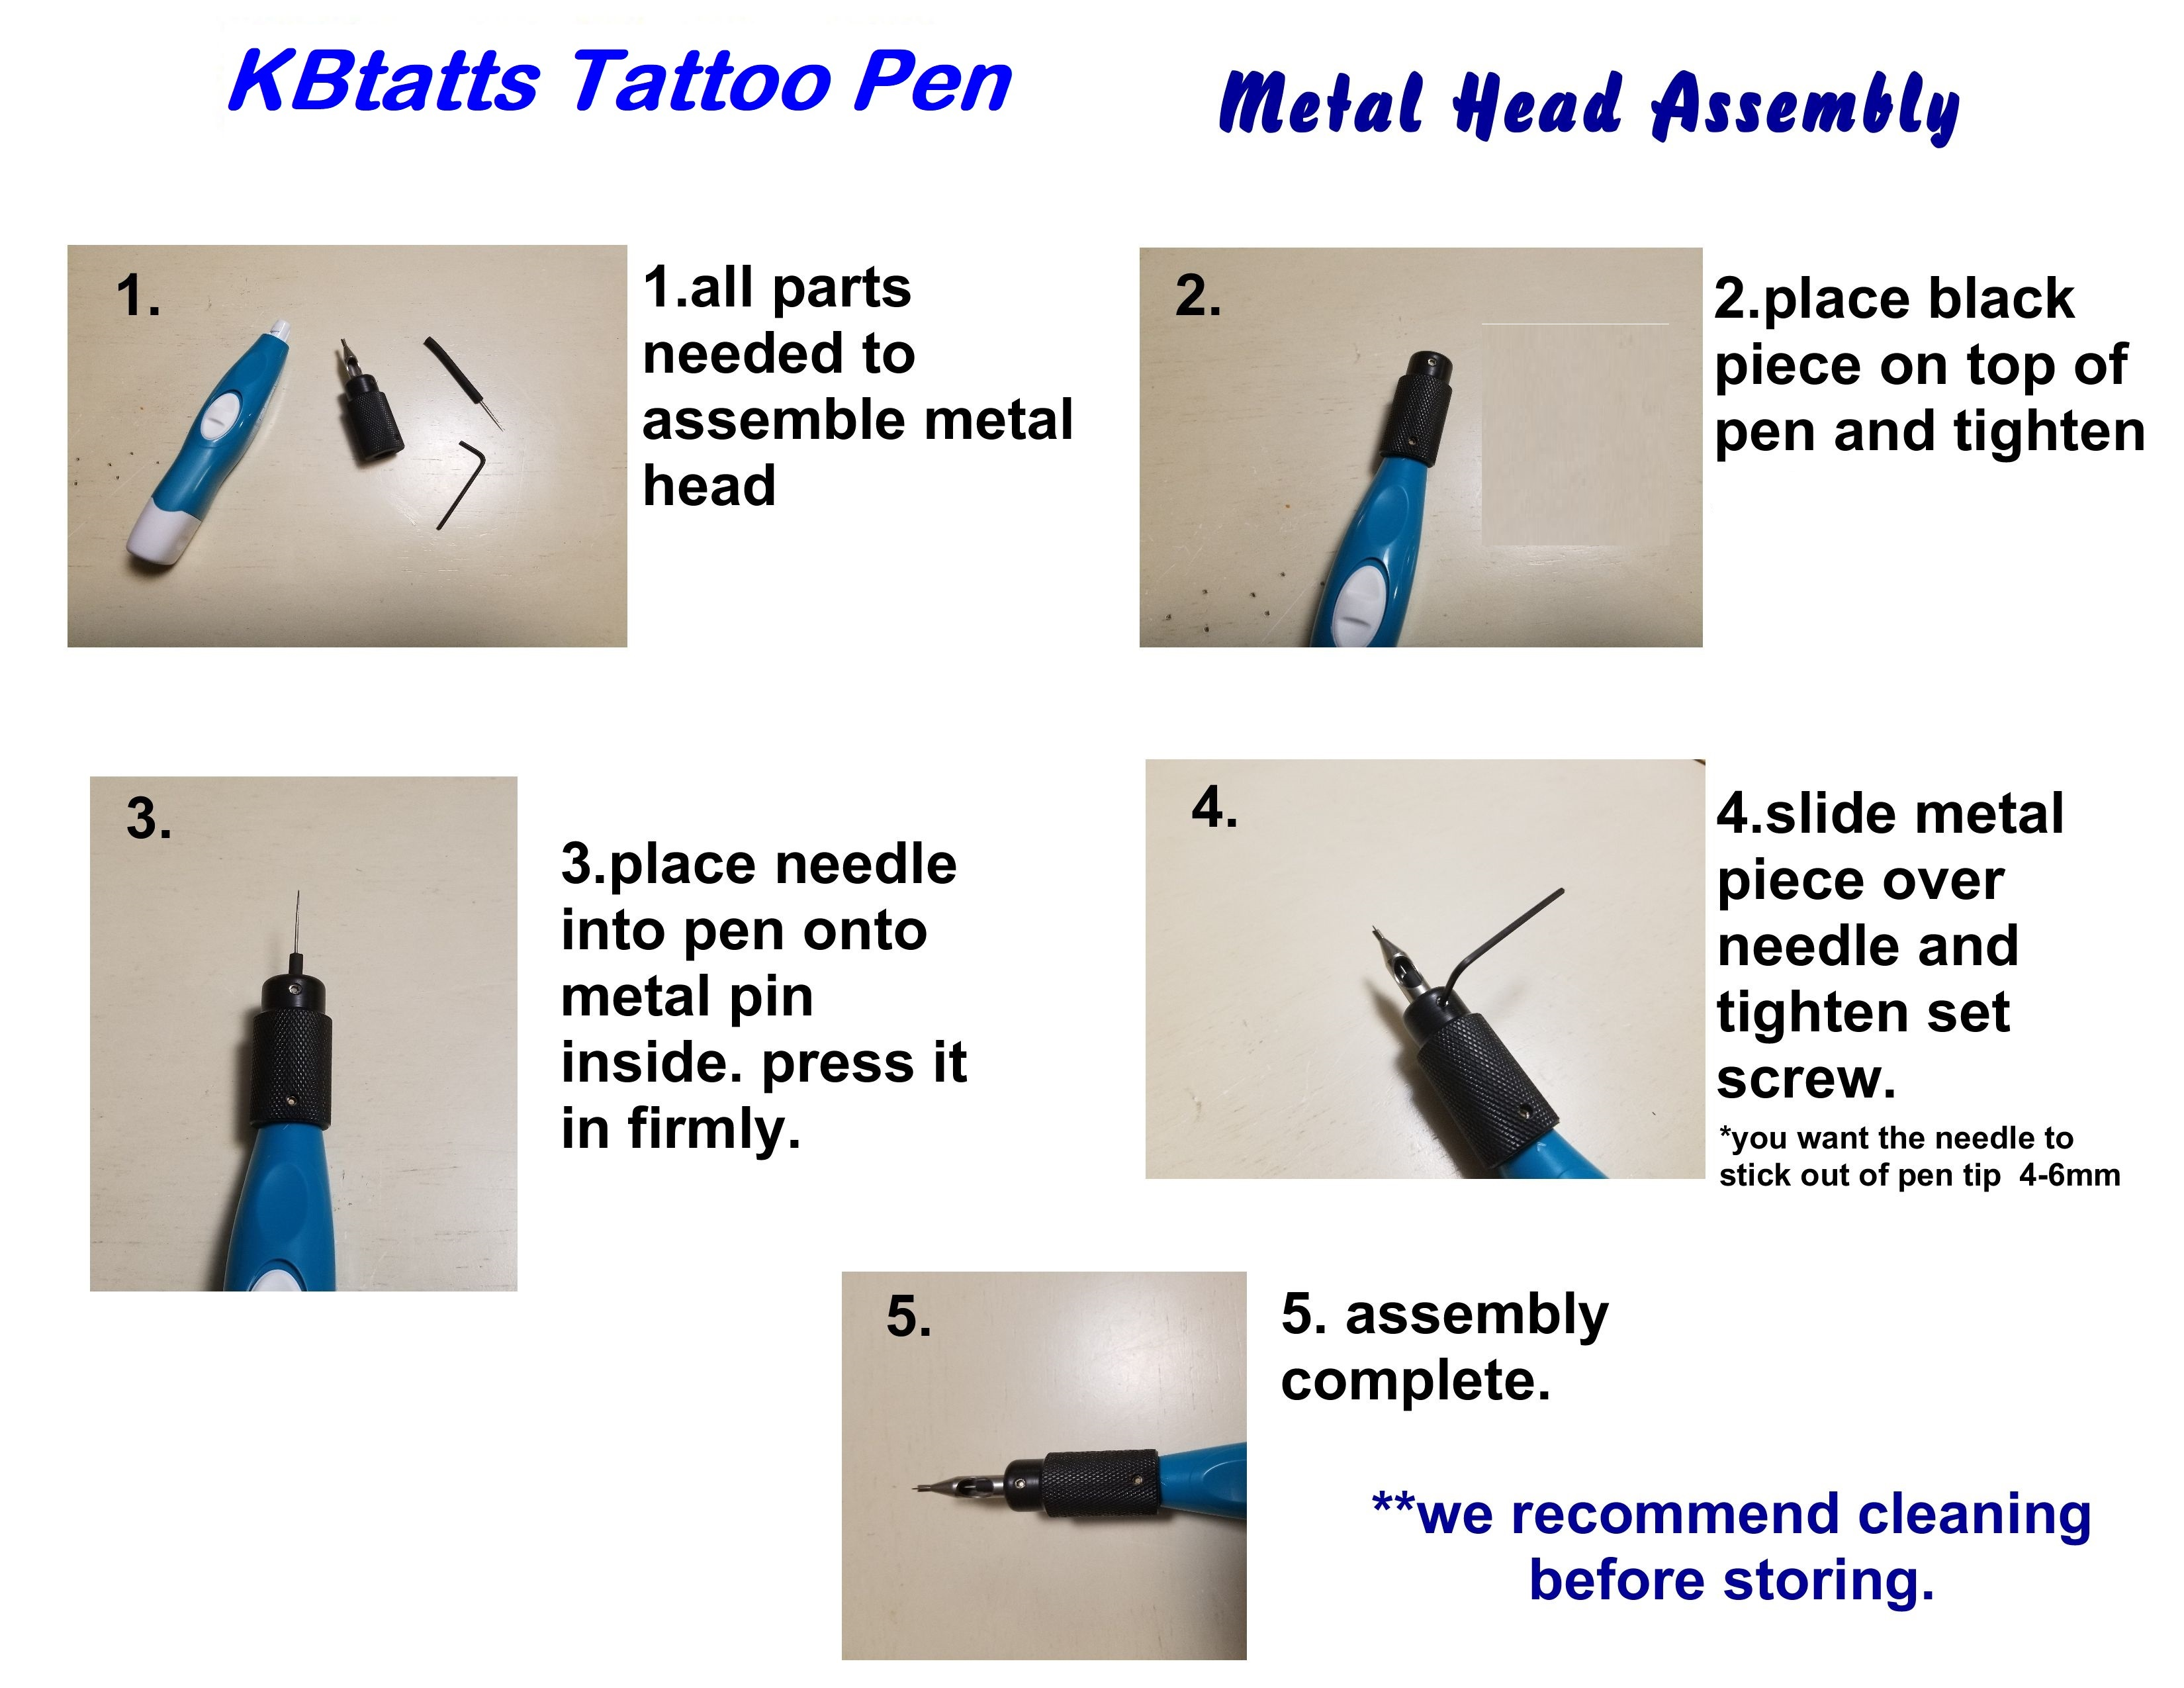 tattoo machine assembly instructions